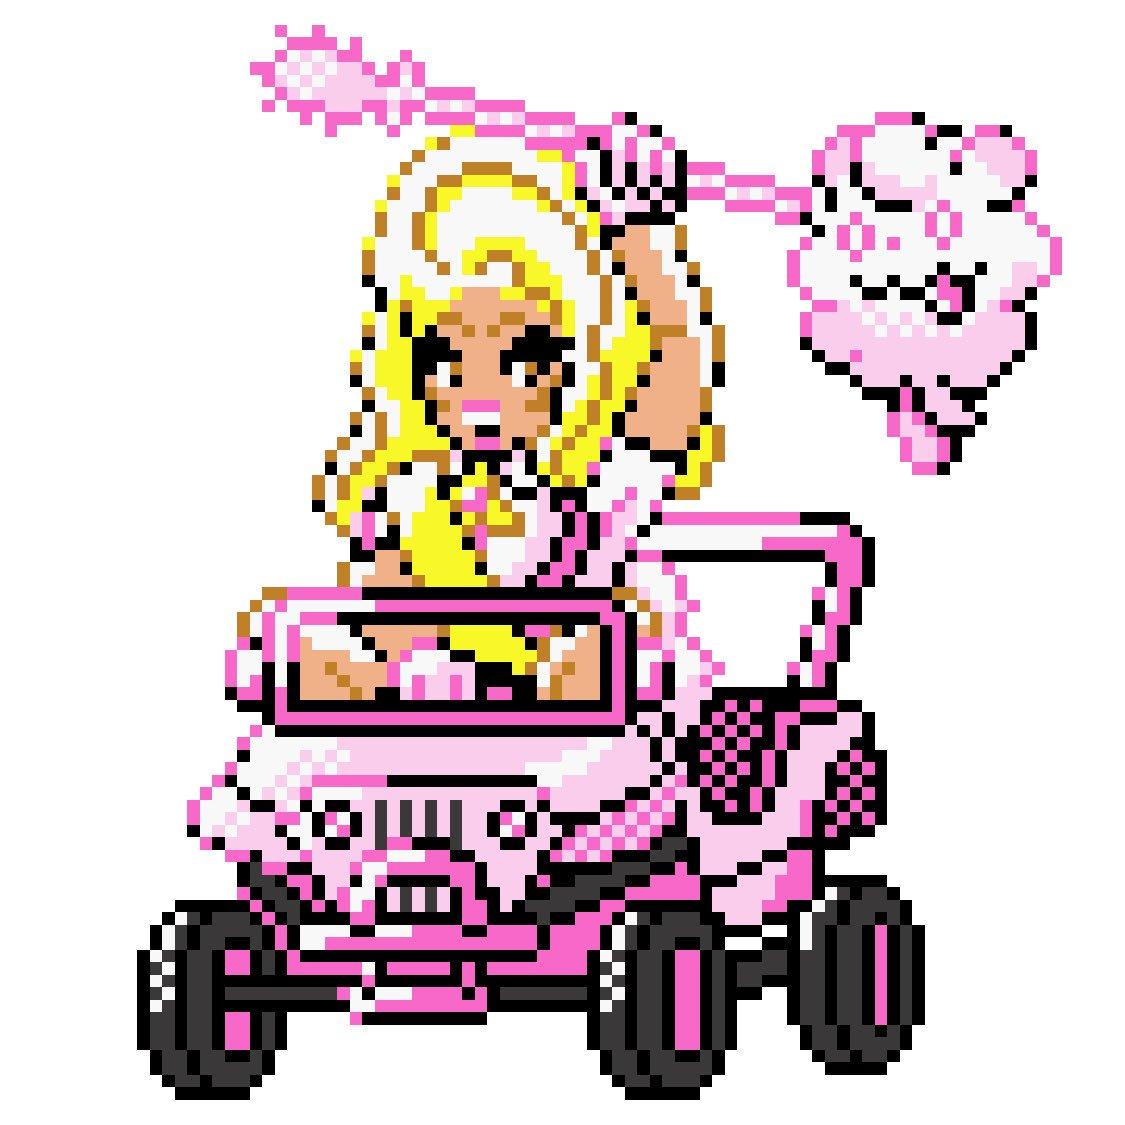 trixie mattell rupaul's drag race pokémon